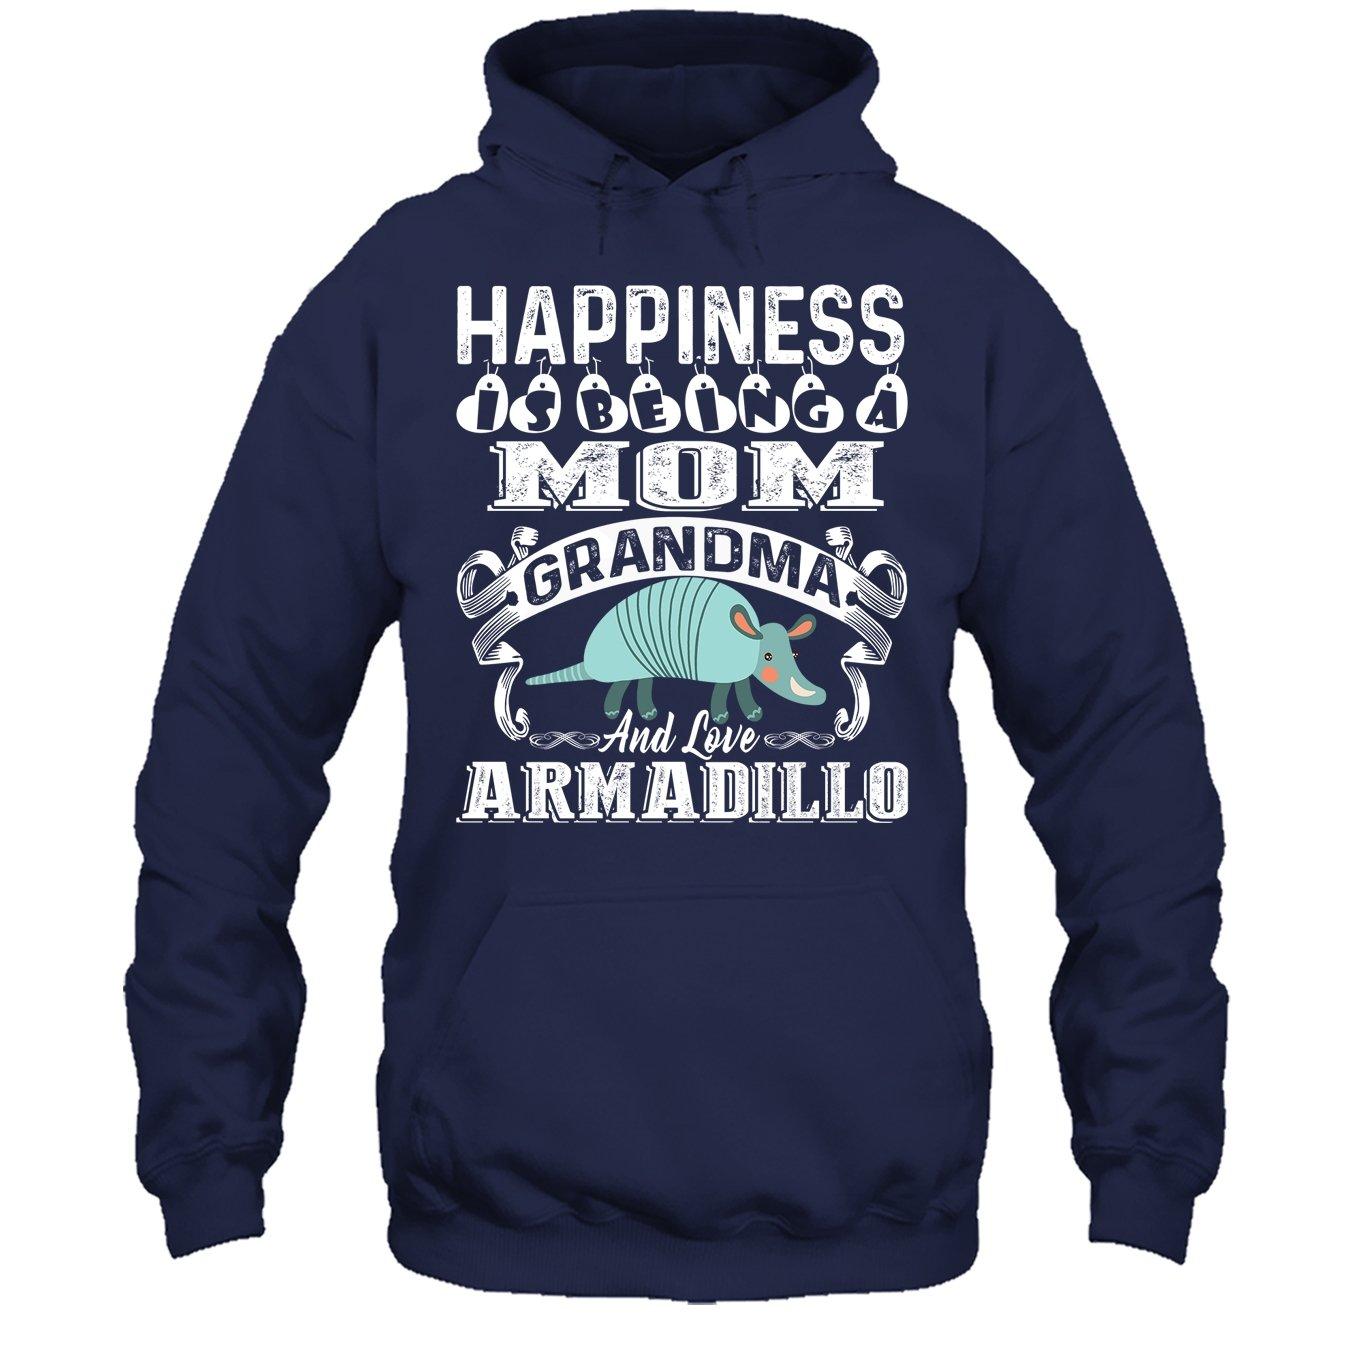 Armadillo Tshirt Design Being A Mom and Love Armadillo T Shirt